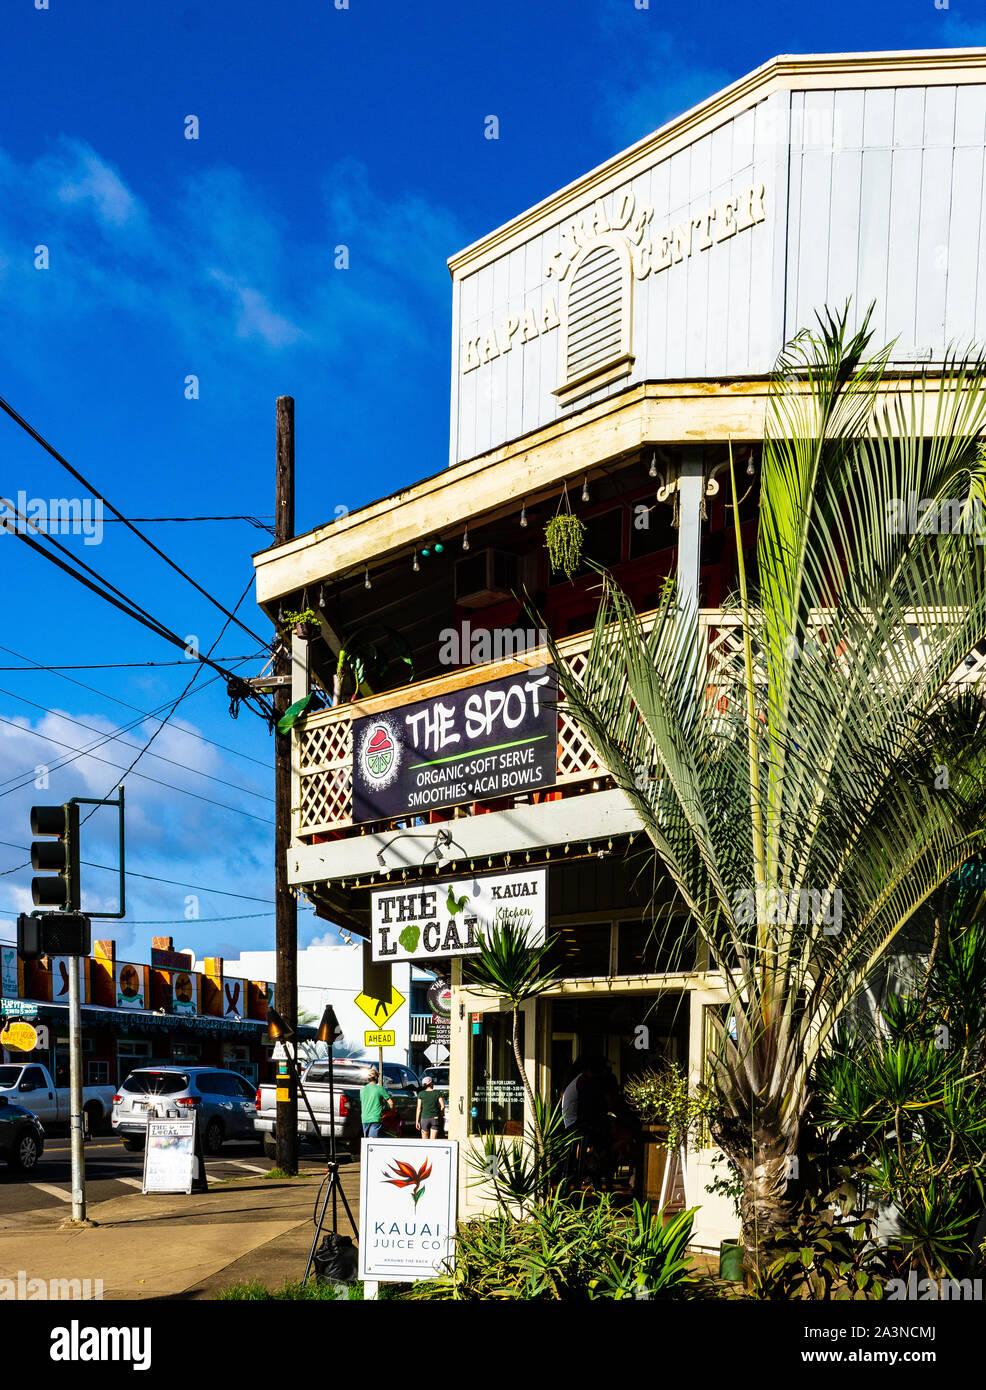 Bar, Main St, Kapaa, Kauai, Hawaii, Stati Uniti Foto Stock